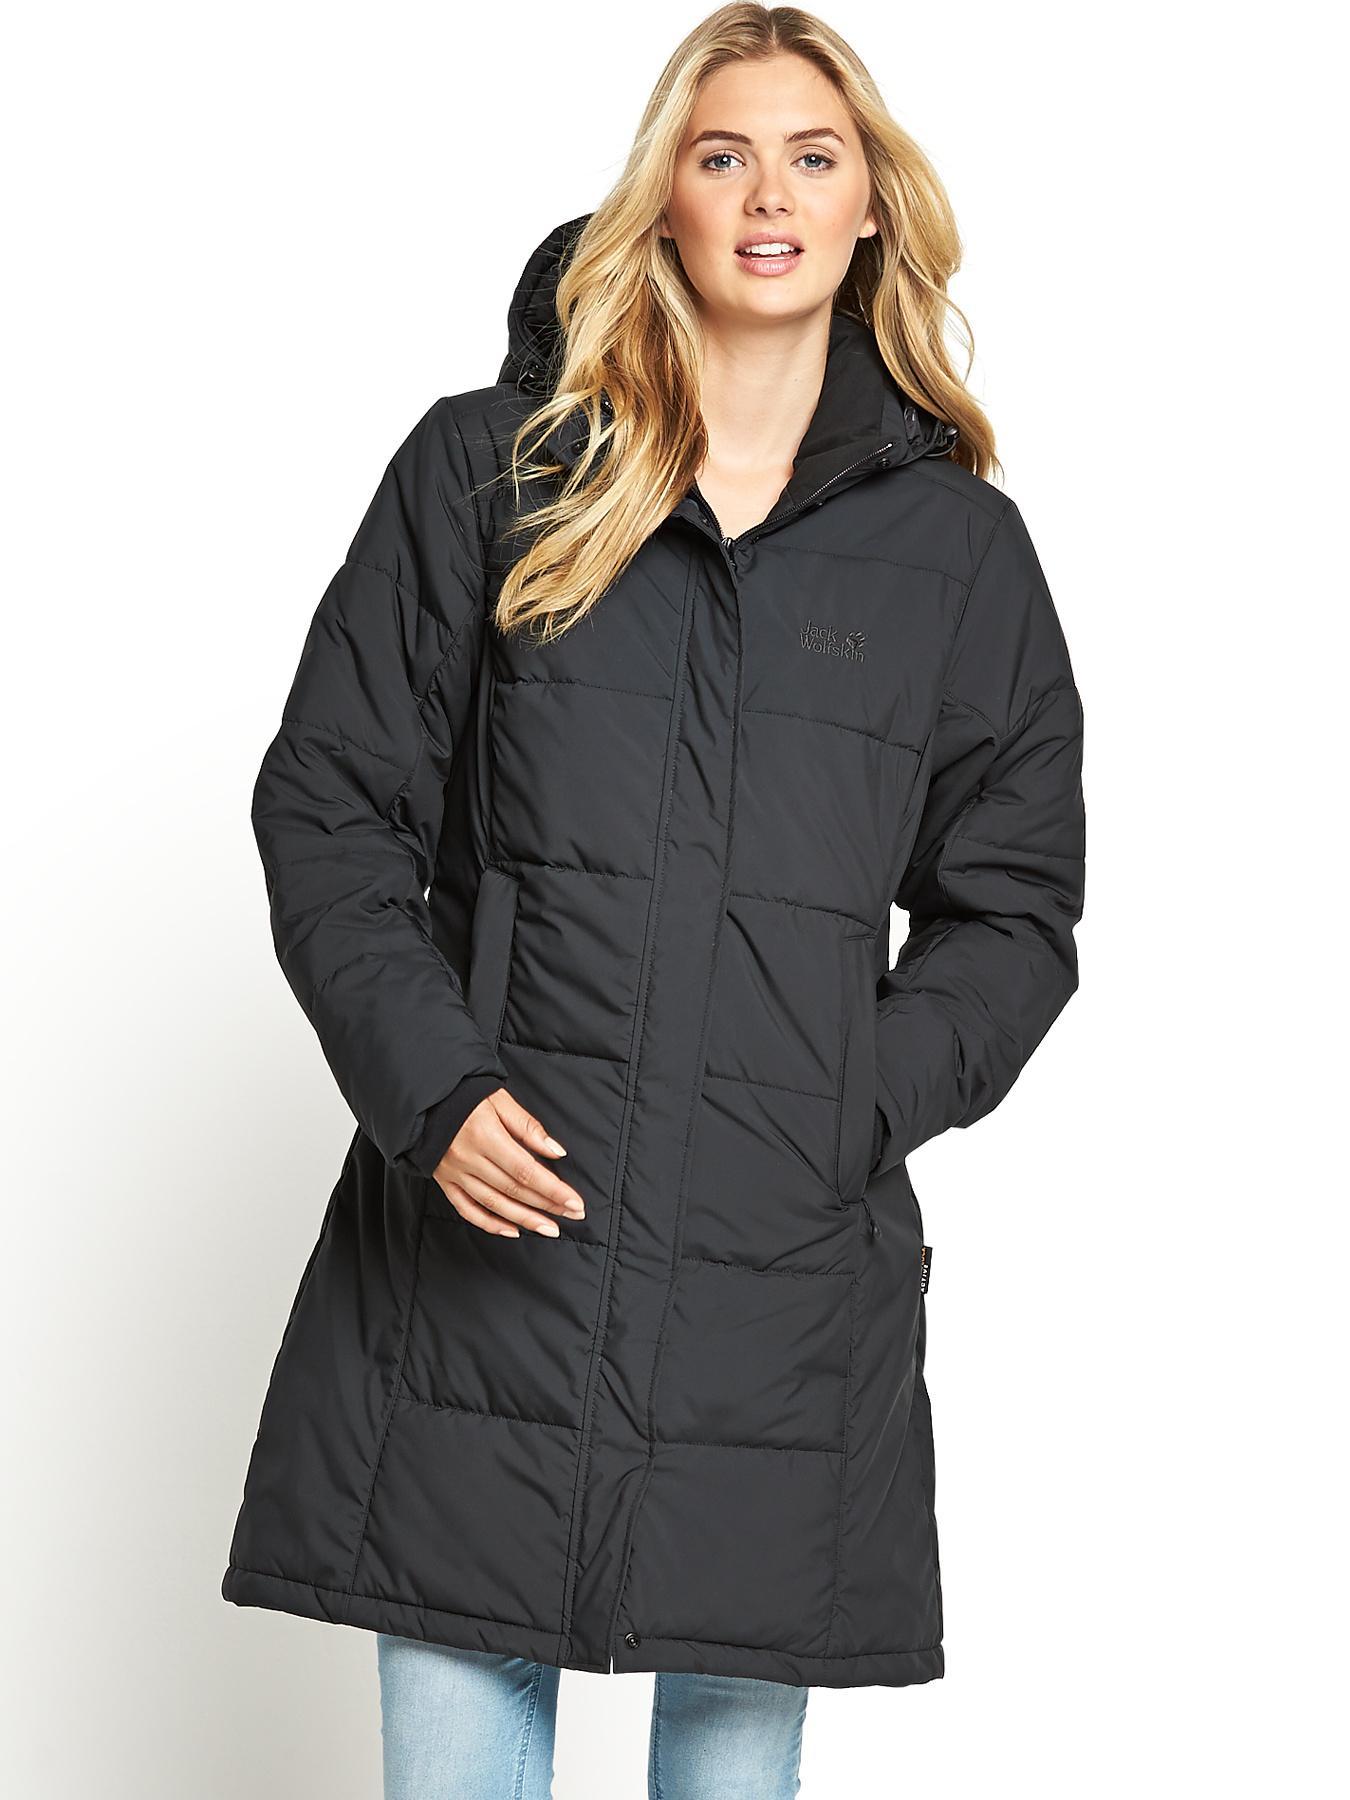 Jack Wolfskin Iceguard Jacket